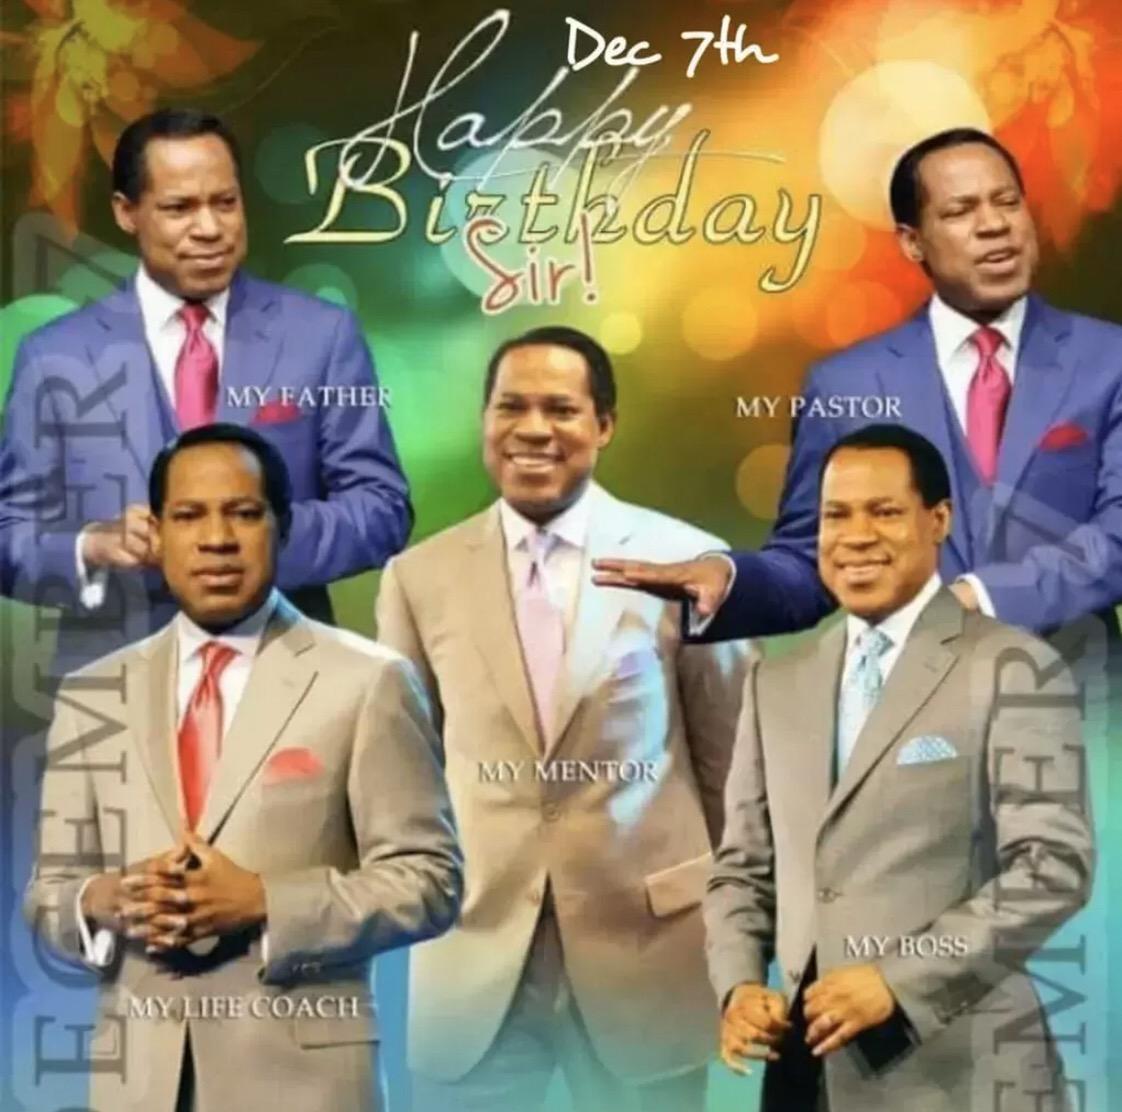 Happy Birthday Pastor! I love